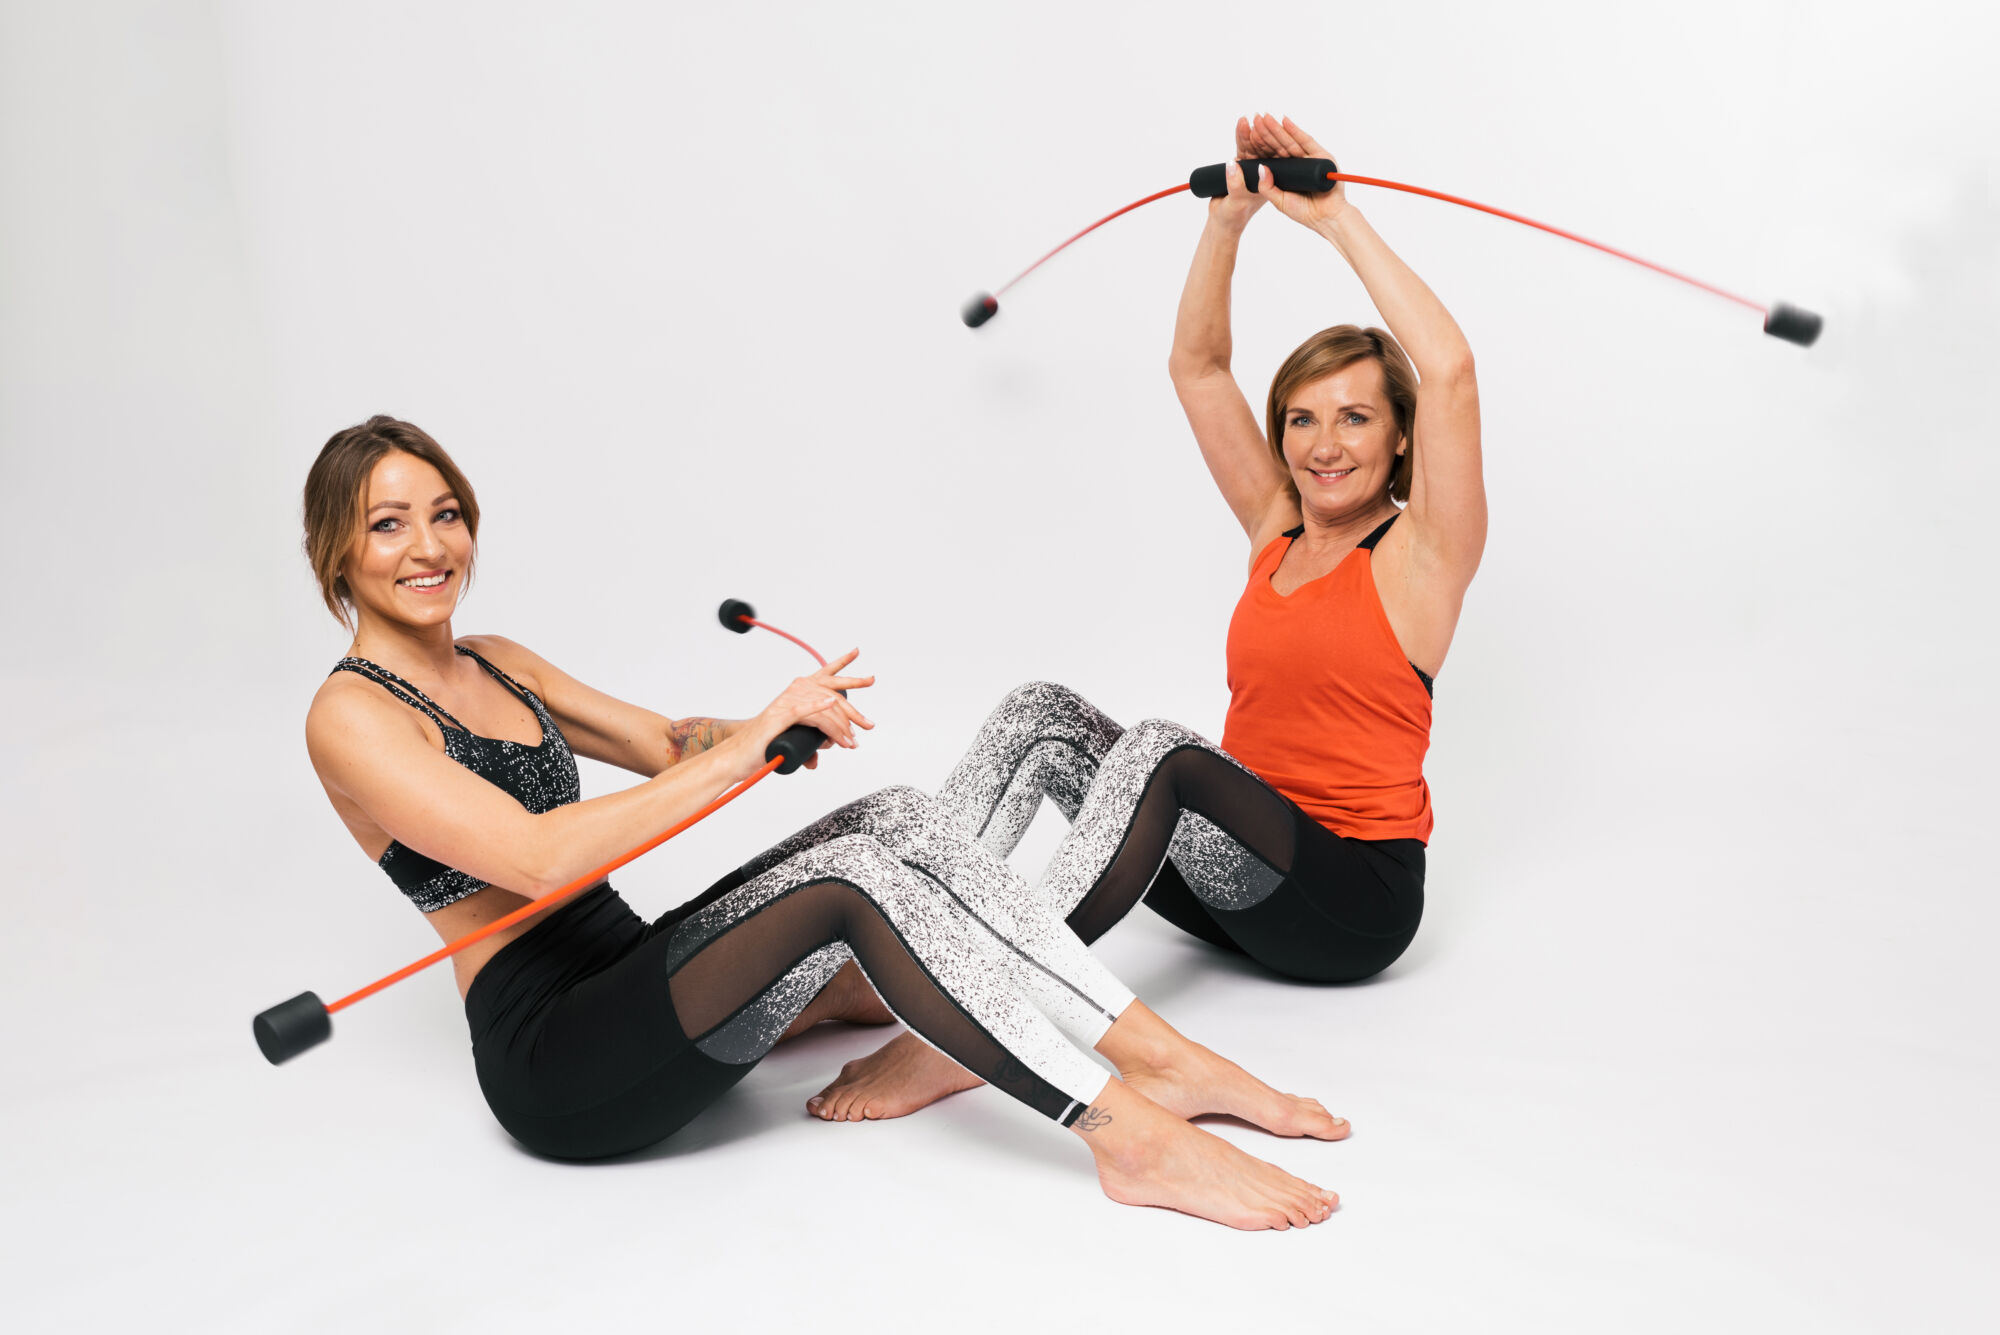 flexibar-fitpainfree-zdravazada-bezbolesti-hanatoufarova-stred-core-svaly-cviceni-zdravotni-cviky-zdravi-zdravetelo